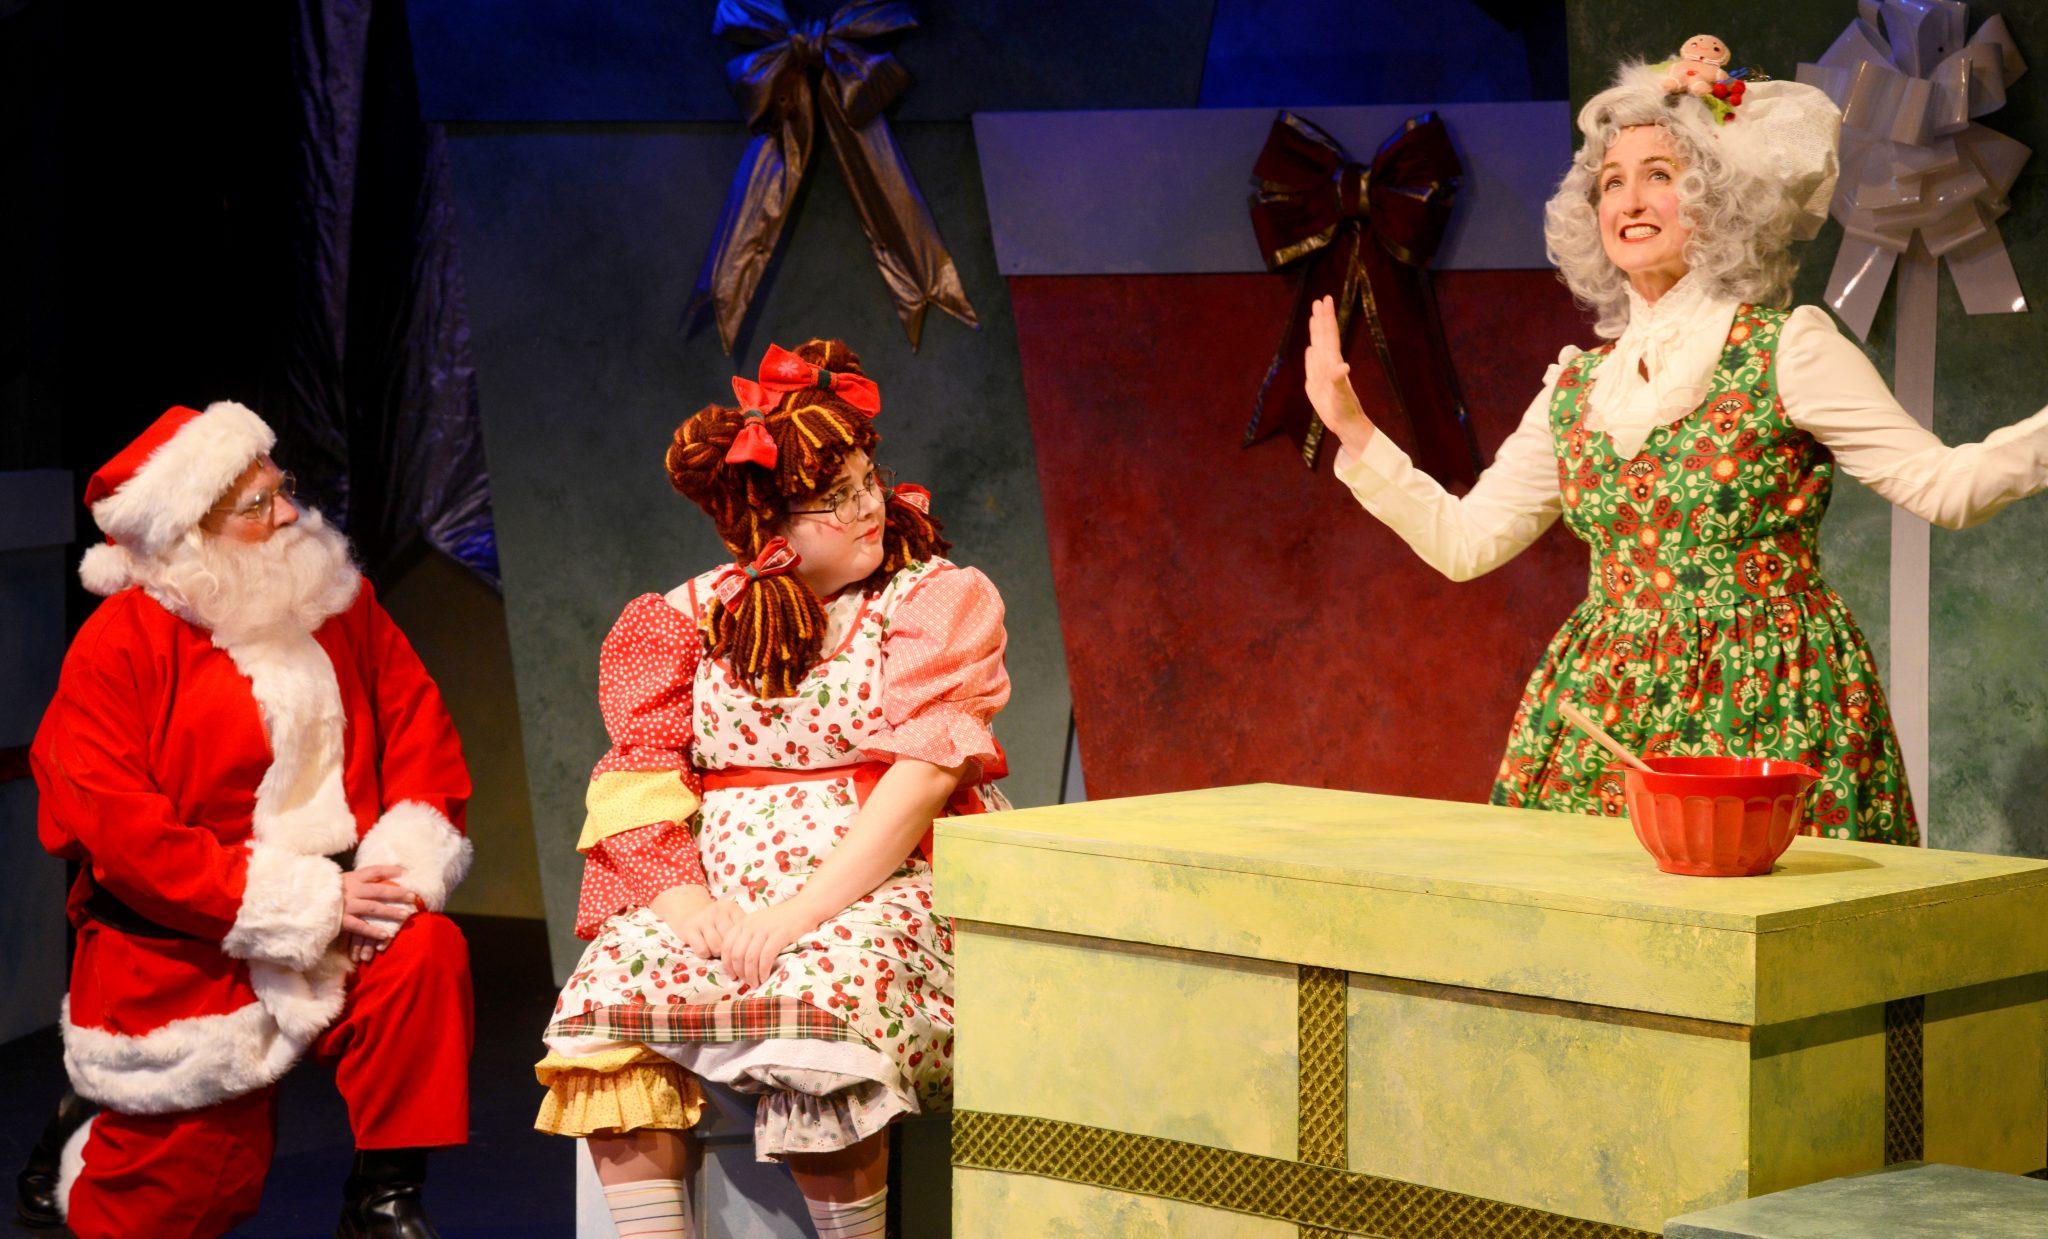 Eleanor's Very Merry Christmas Wish-The Musical